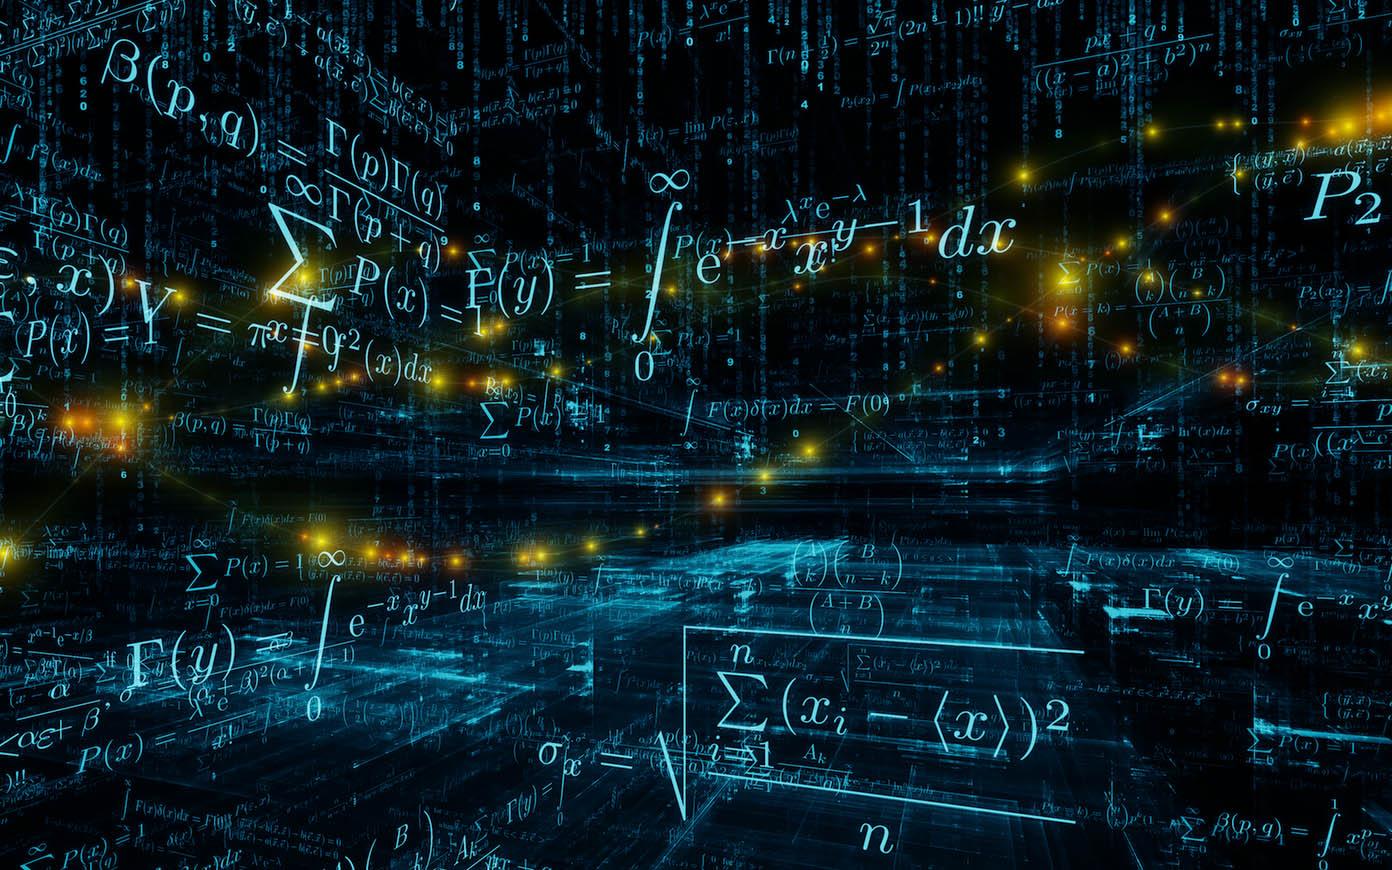 matematica_per_controllo_di_qualita_1533635566.png